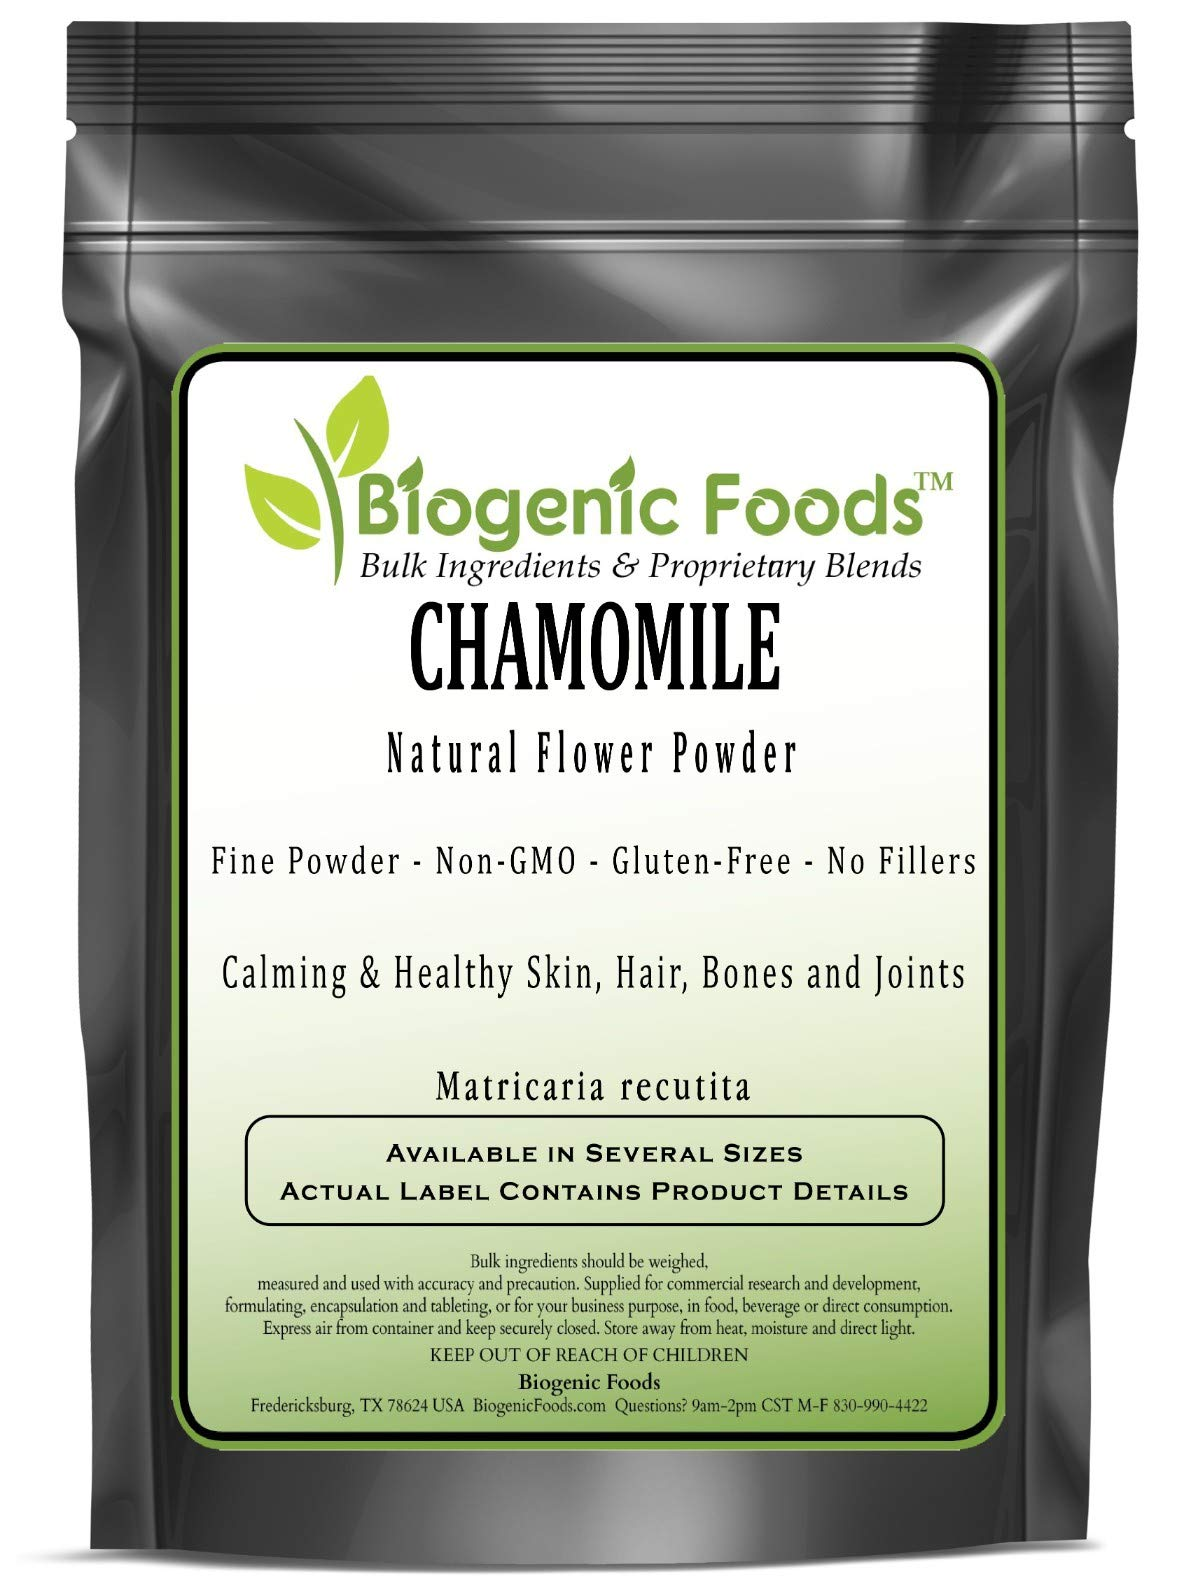 Chamomile - Natural Flower Powder (Matricaria recutita), 2 kg